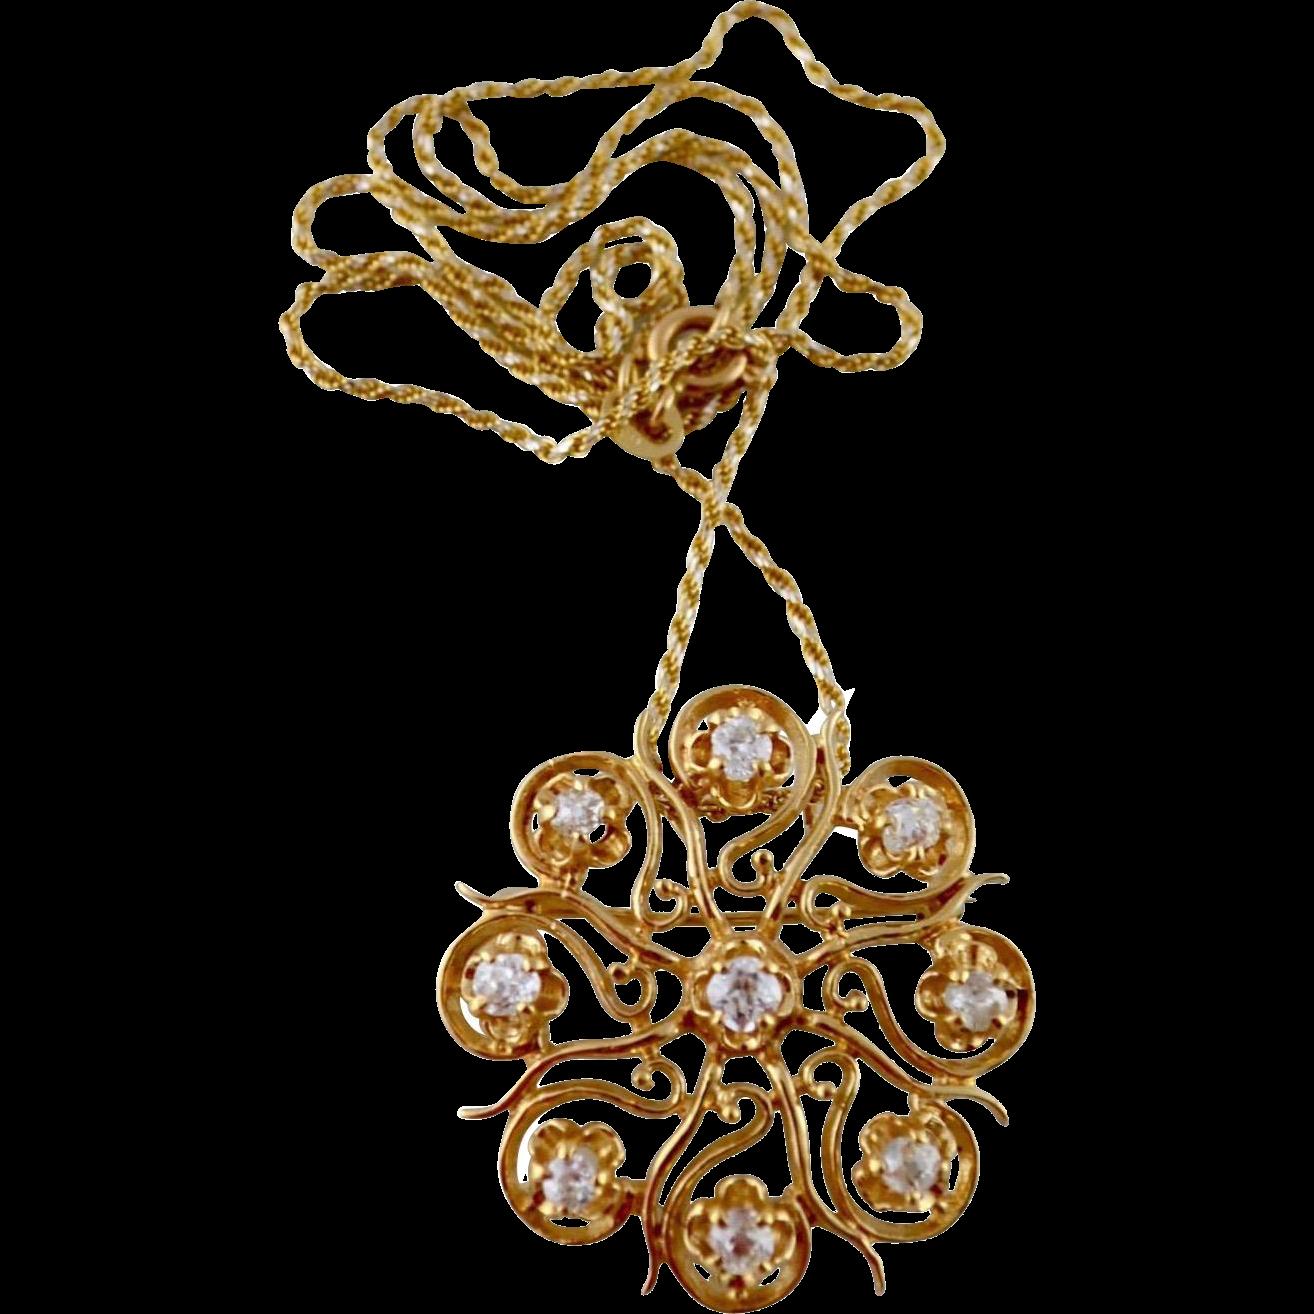 Victorian Style 0.96 Carat Old Mine Cut Diamond 14kt Gold Pendant / Brooch 50% Off